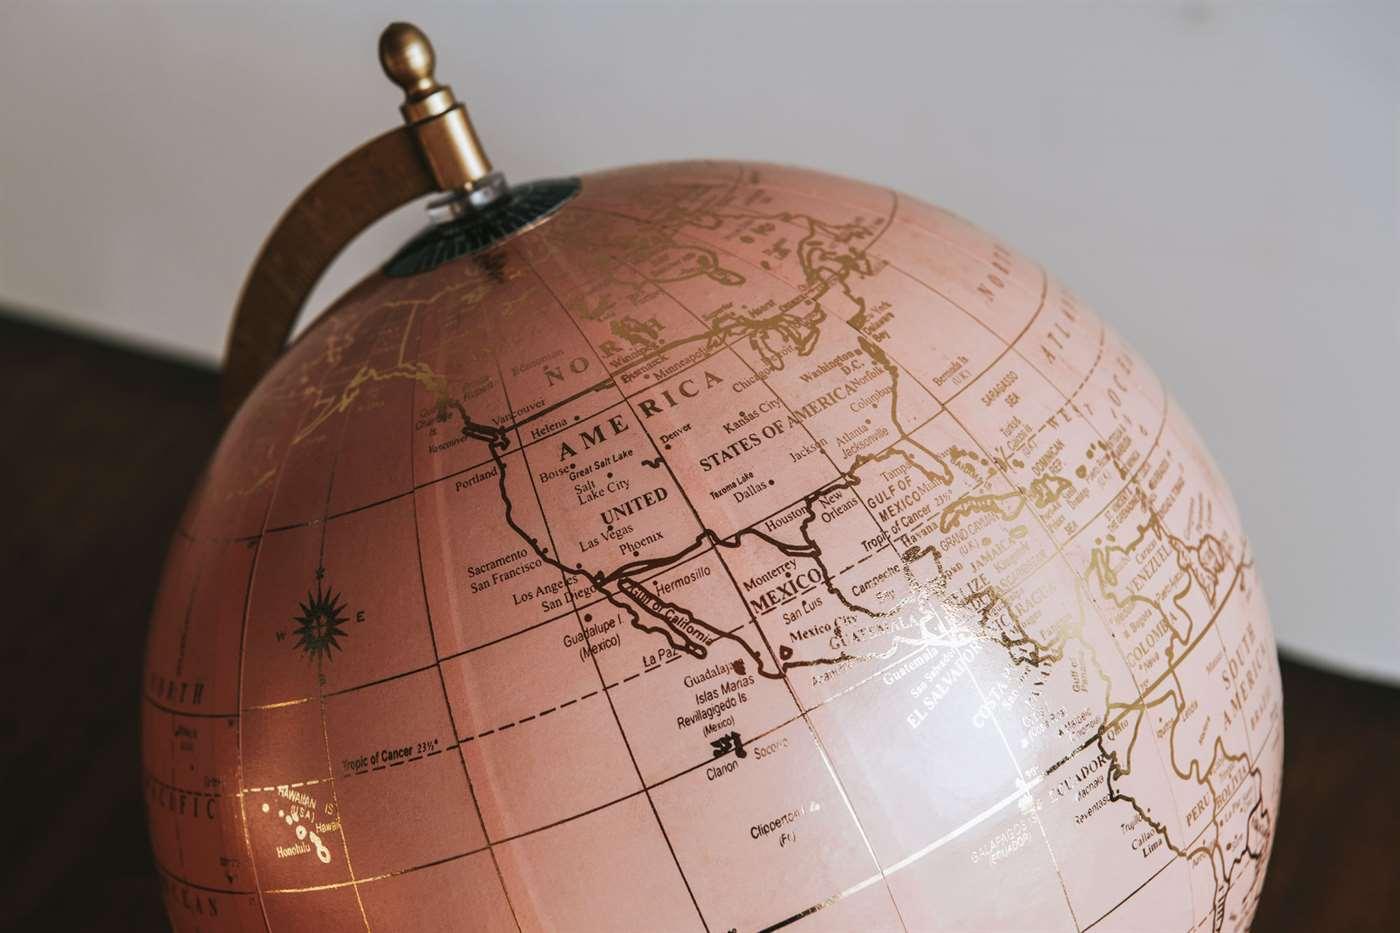 Traducción profesional para Agencias de comunicación, traducción profesional agencias de comunicación